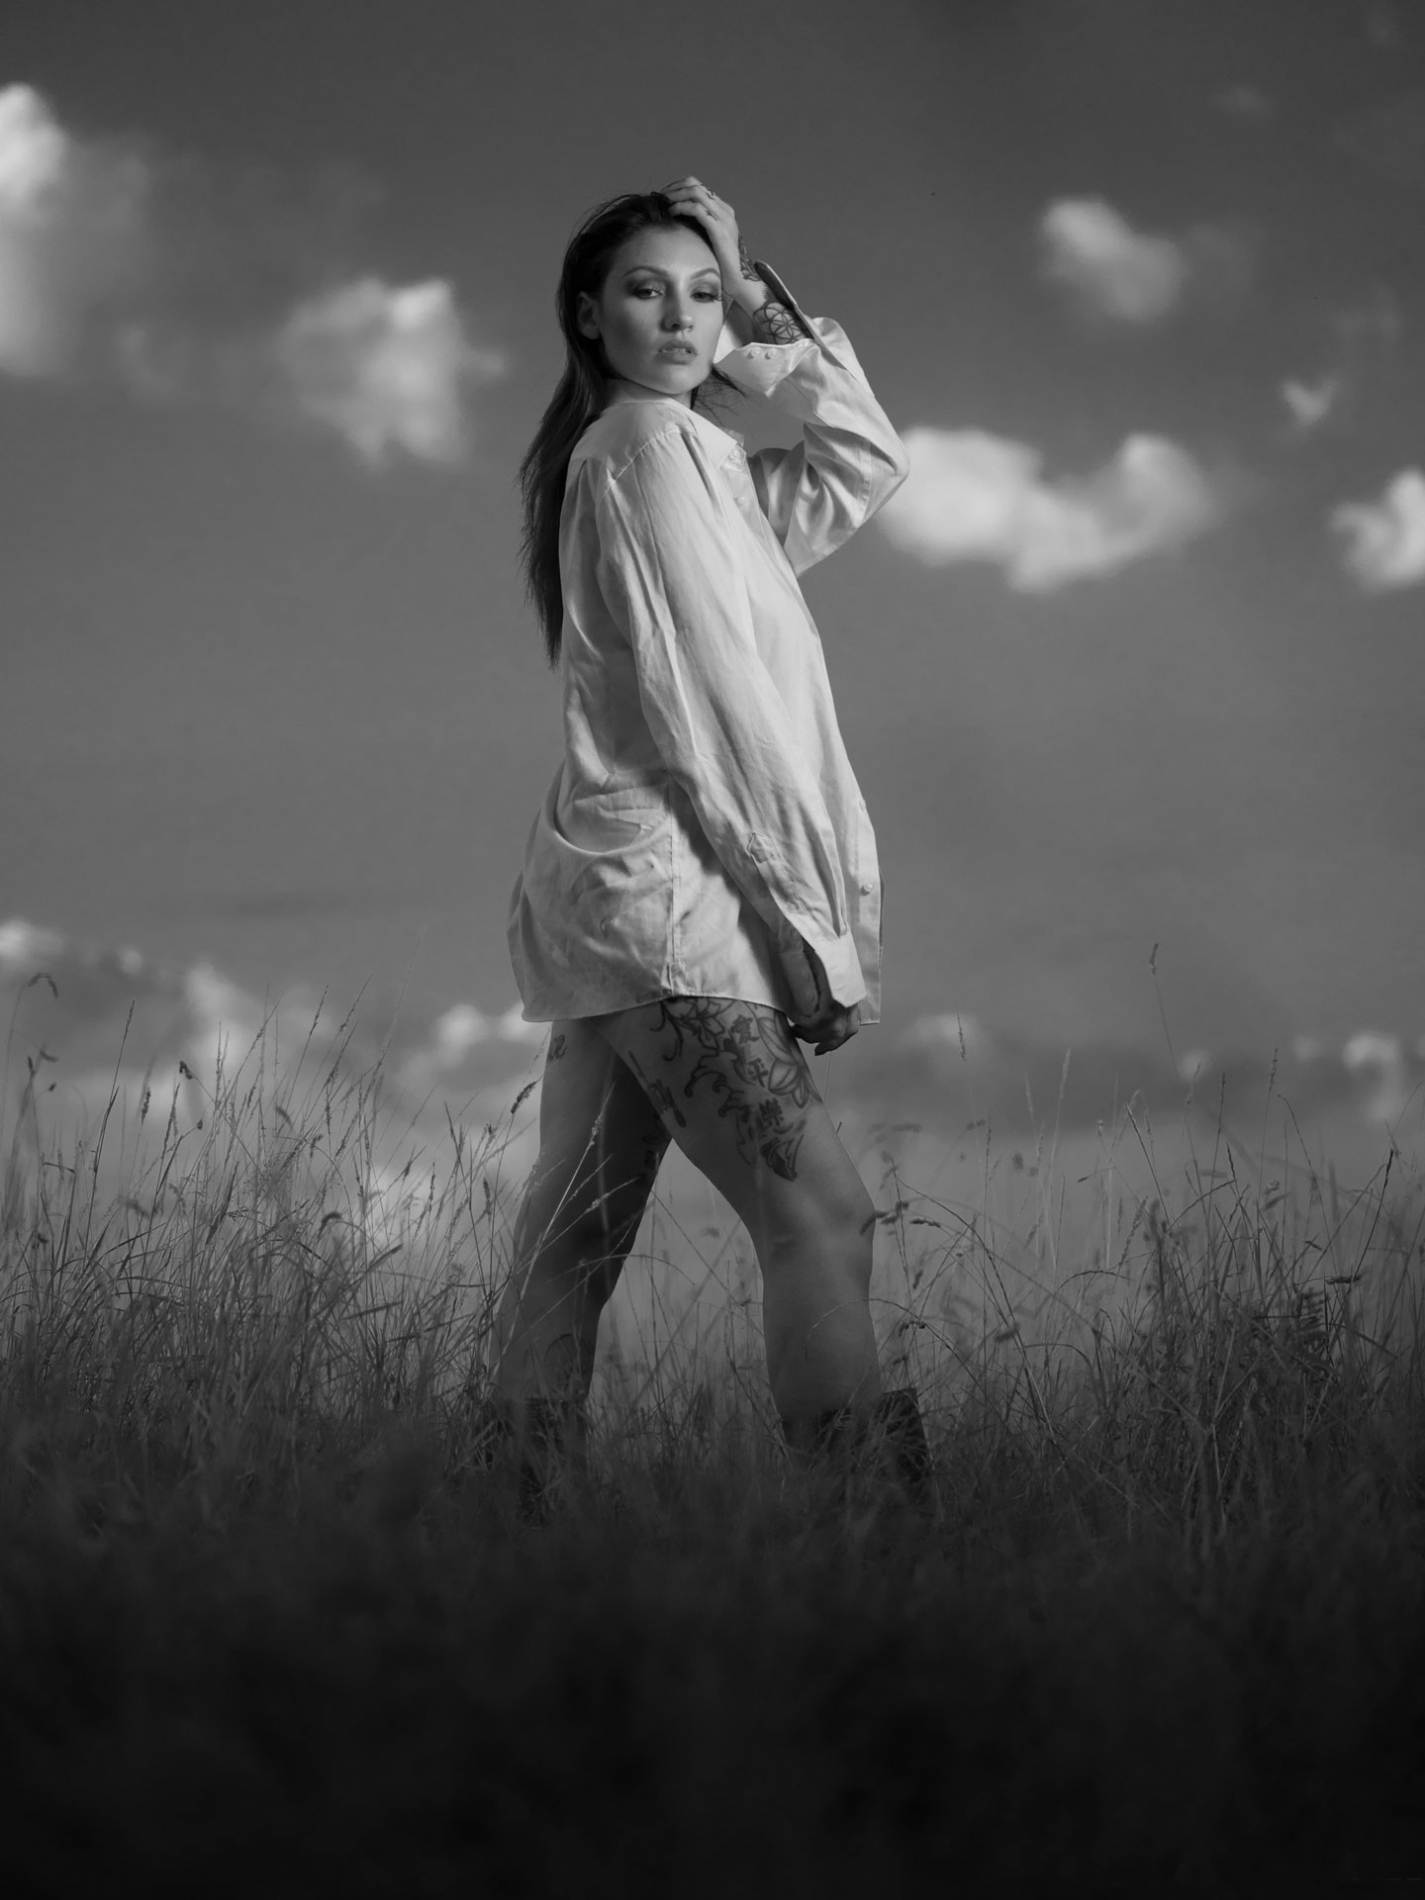 Girl-in-grass-mono